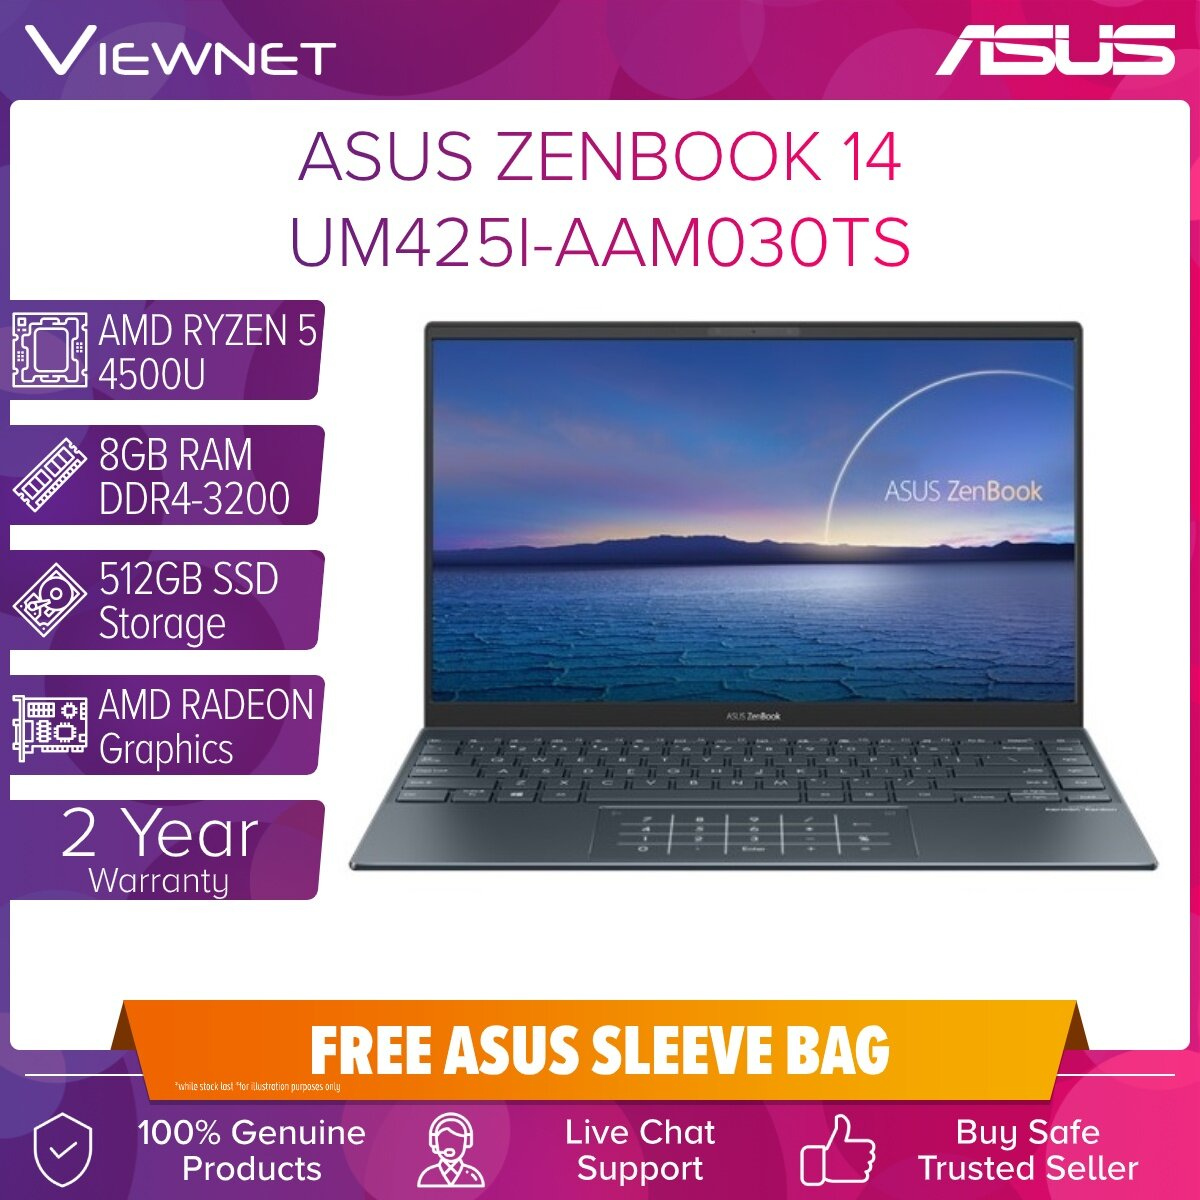 ASUS ZENBOOK 14 UM425I-AAM030TS LAPTOP AMD RYZEN 5 4500U 8GB DDR4 512GB SSD AMD RADEON GRAPHIC 14.0